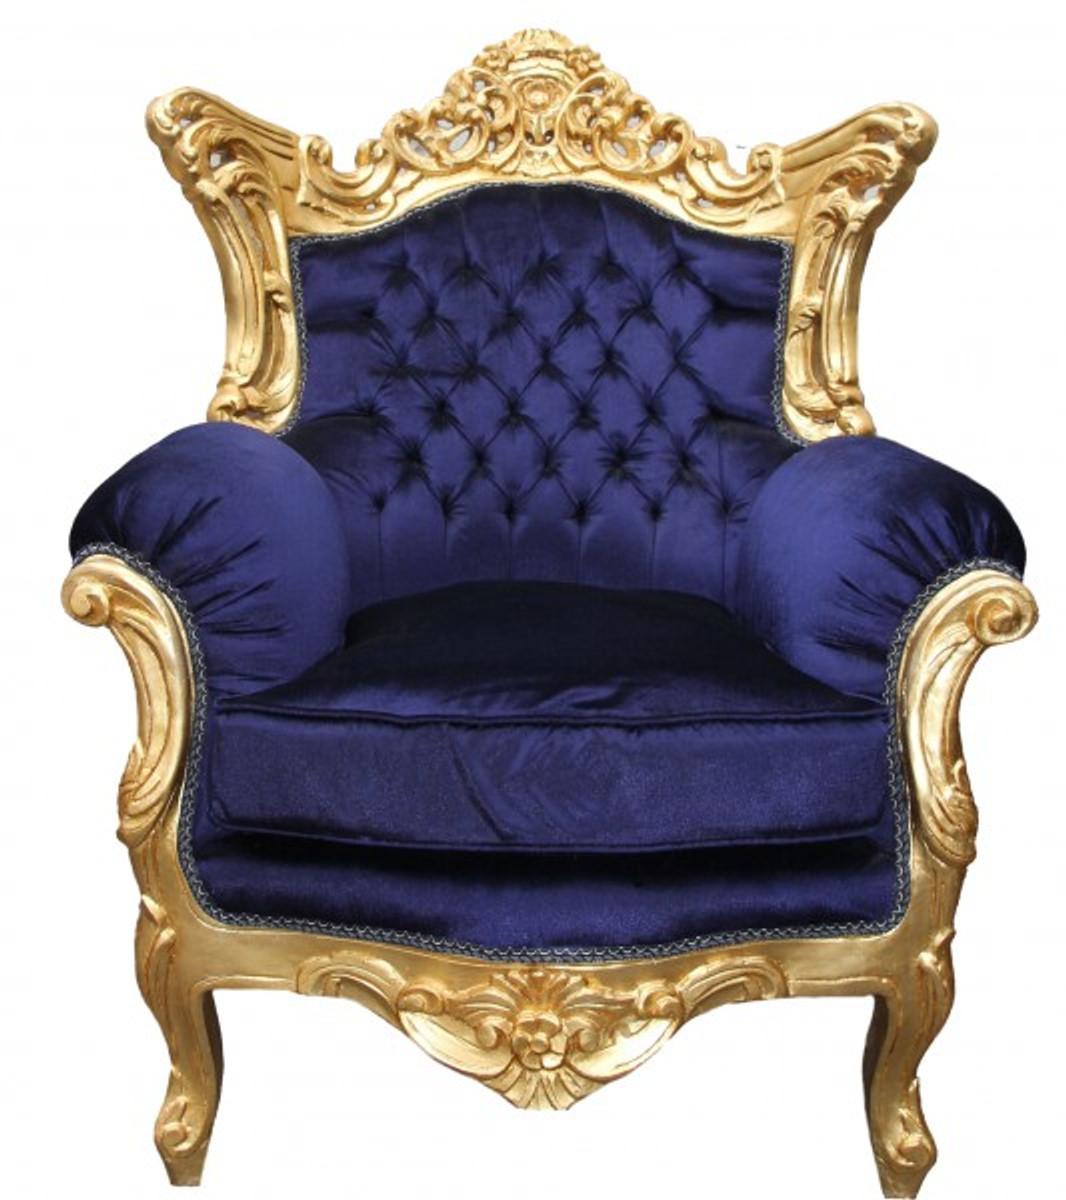 casa padrino barock wohnzimmer set royal blau gold 3er sofa 2er sofa 1 sessel casa padrino. Black Bedroom Furniture Sets. Home Design Ideas